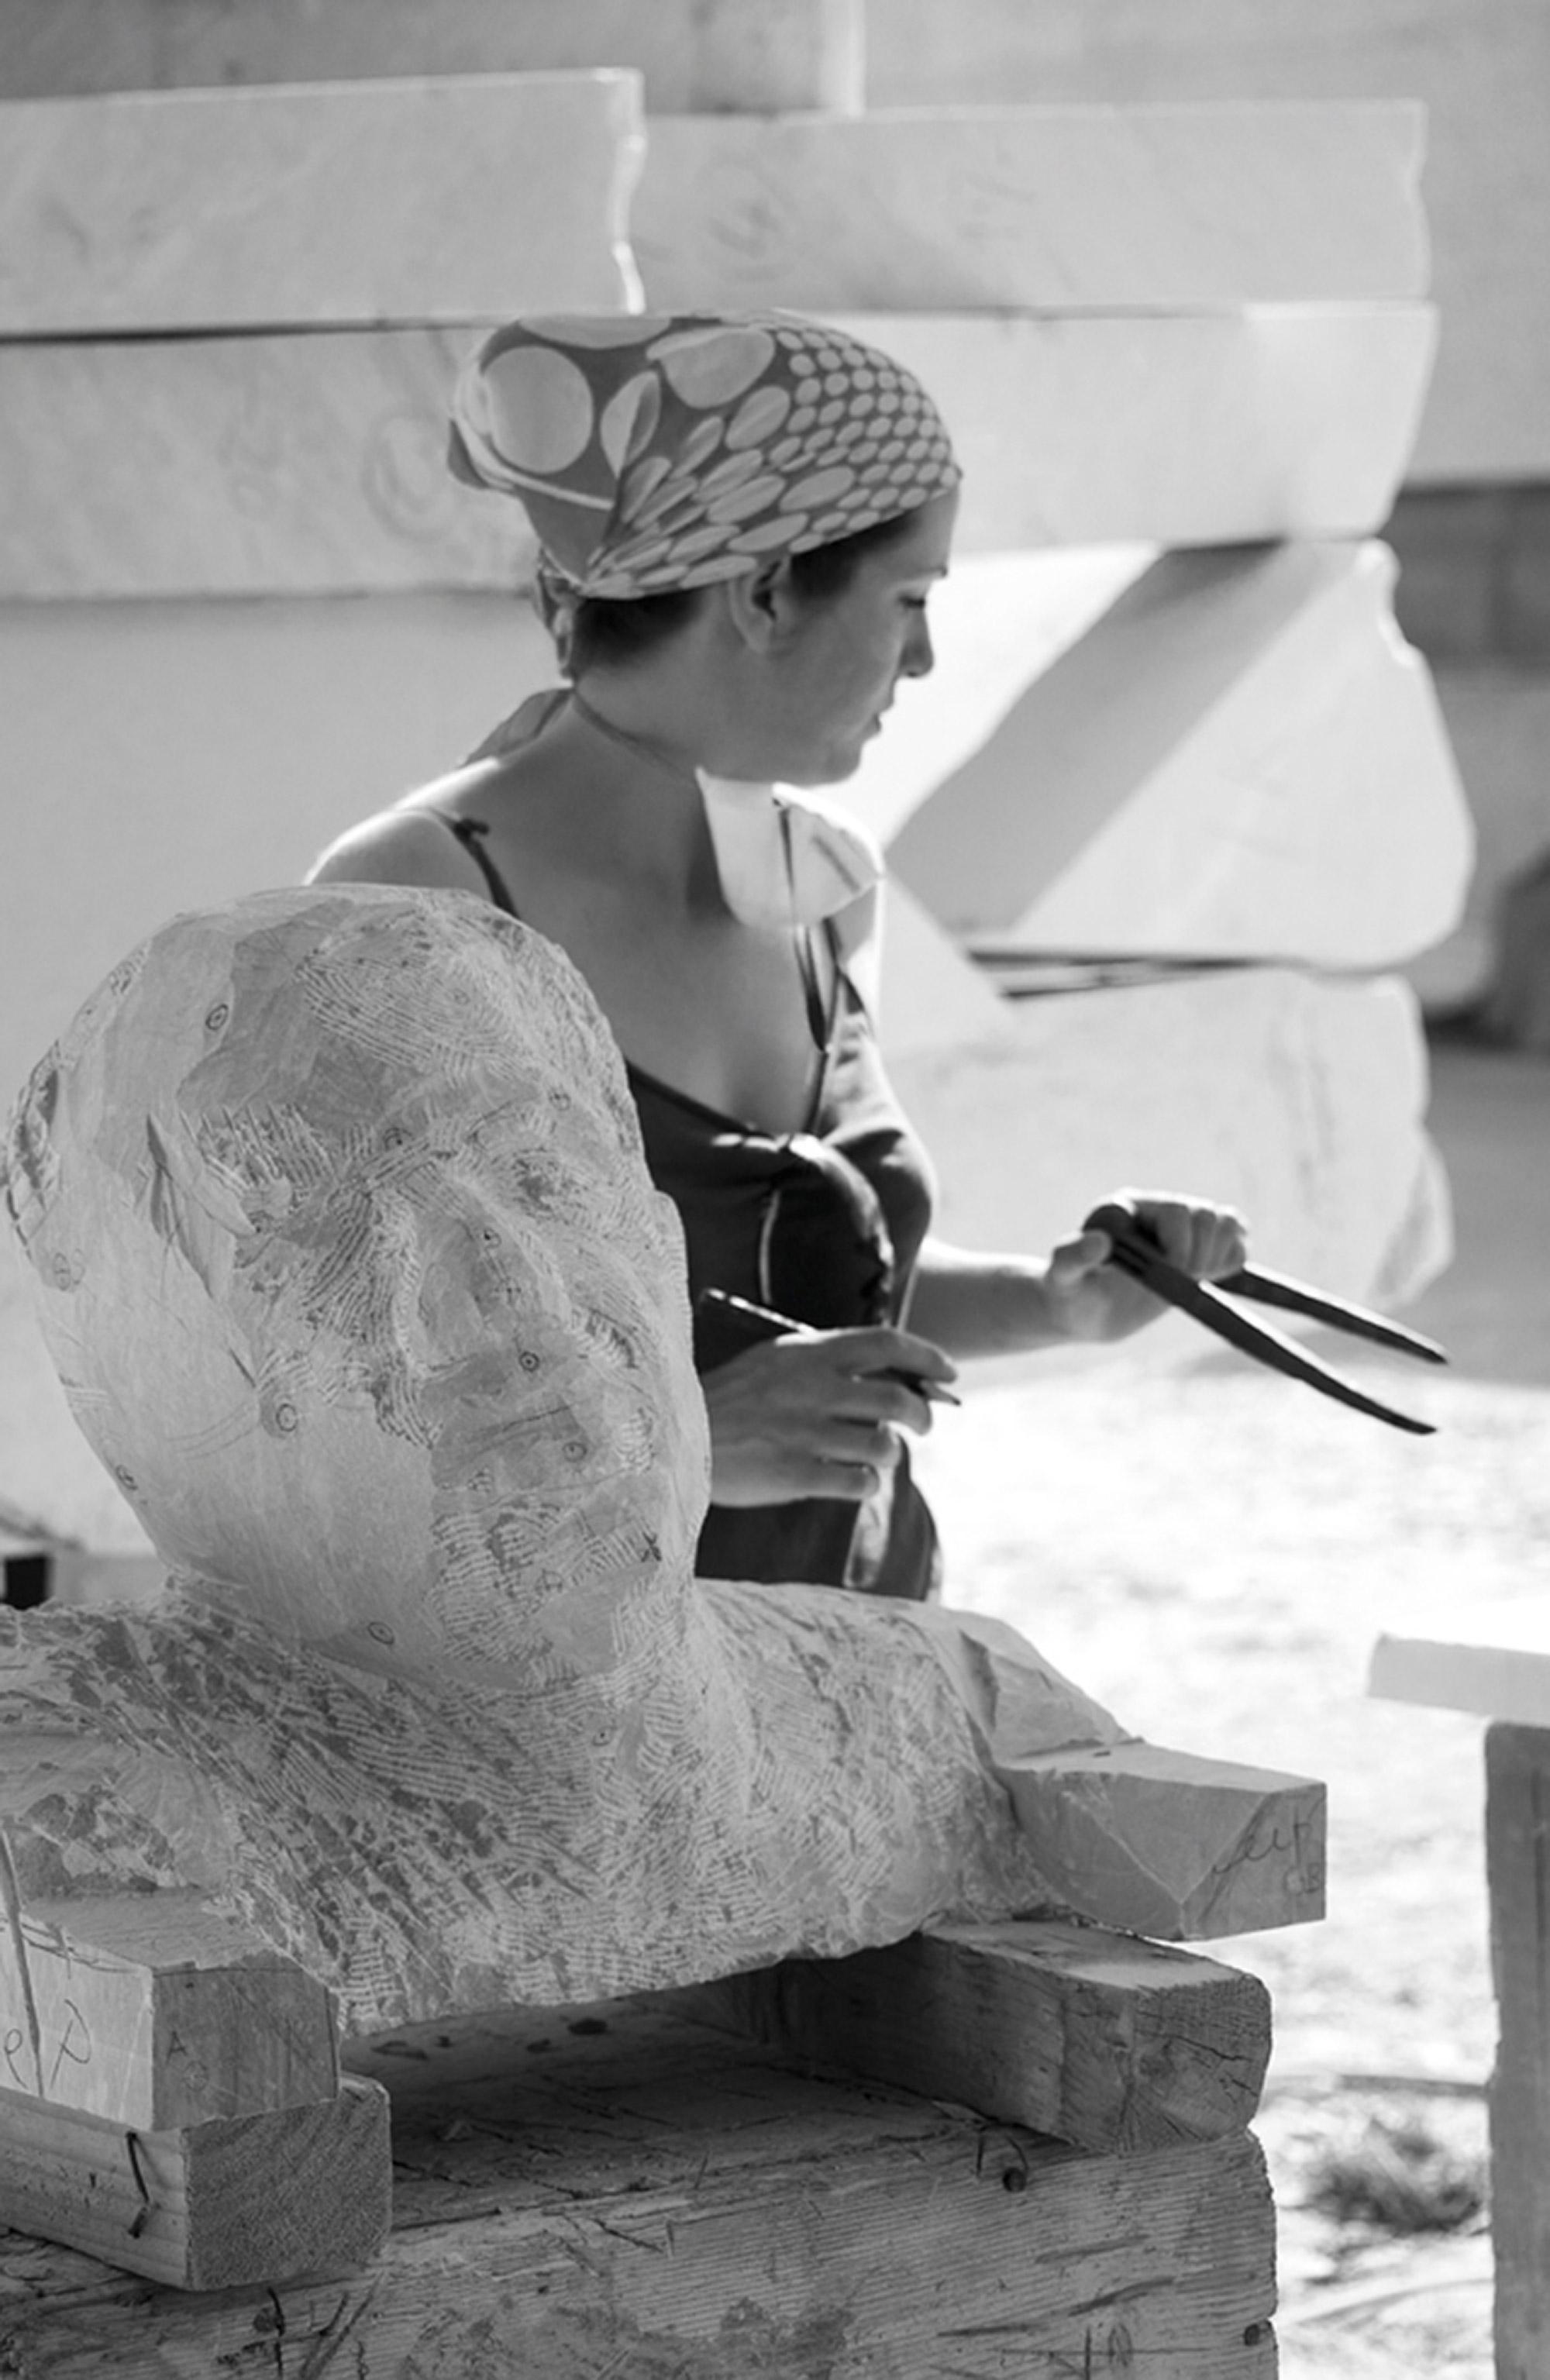 New-York-Academy-of-Art-Carrara-Residency-Heather-Personett-Zoe-Suenson-Taylor20171213_0053.jpg